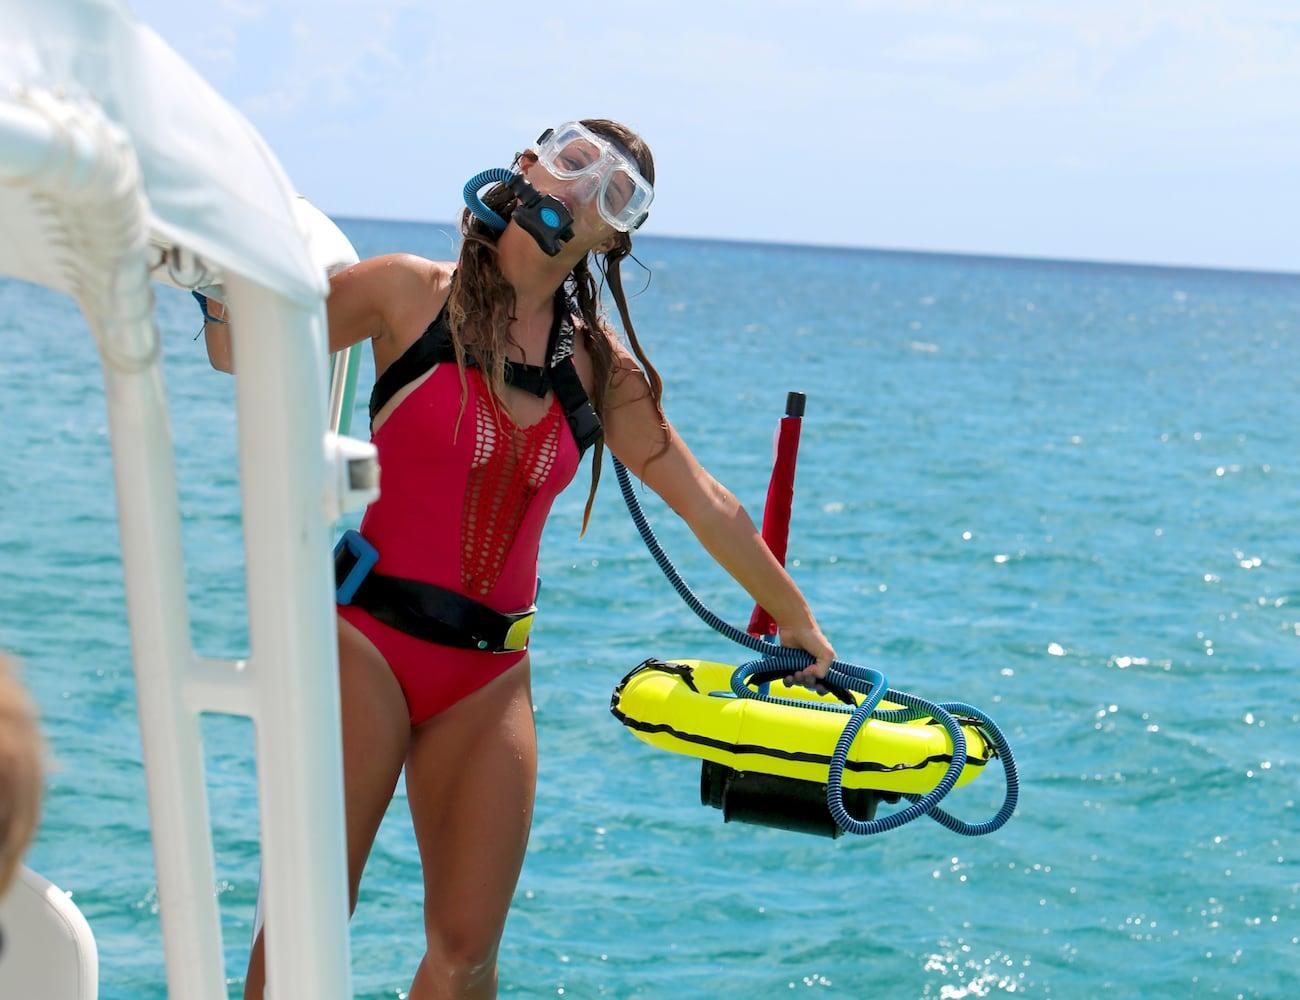 NEMO Portable Dive System by BLU3